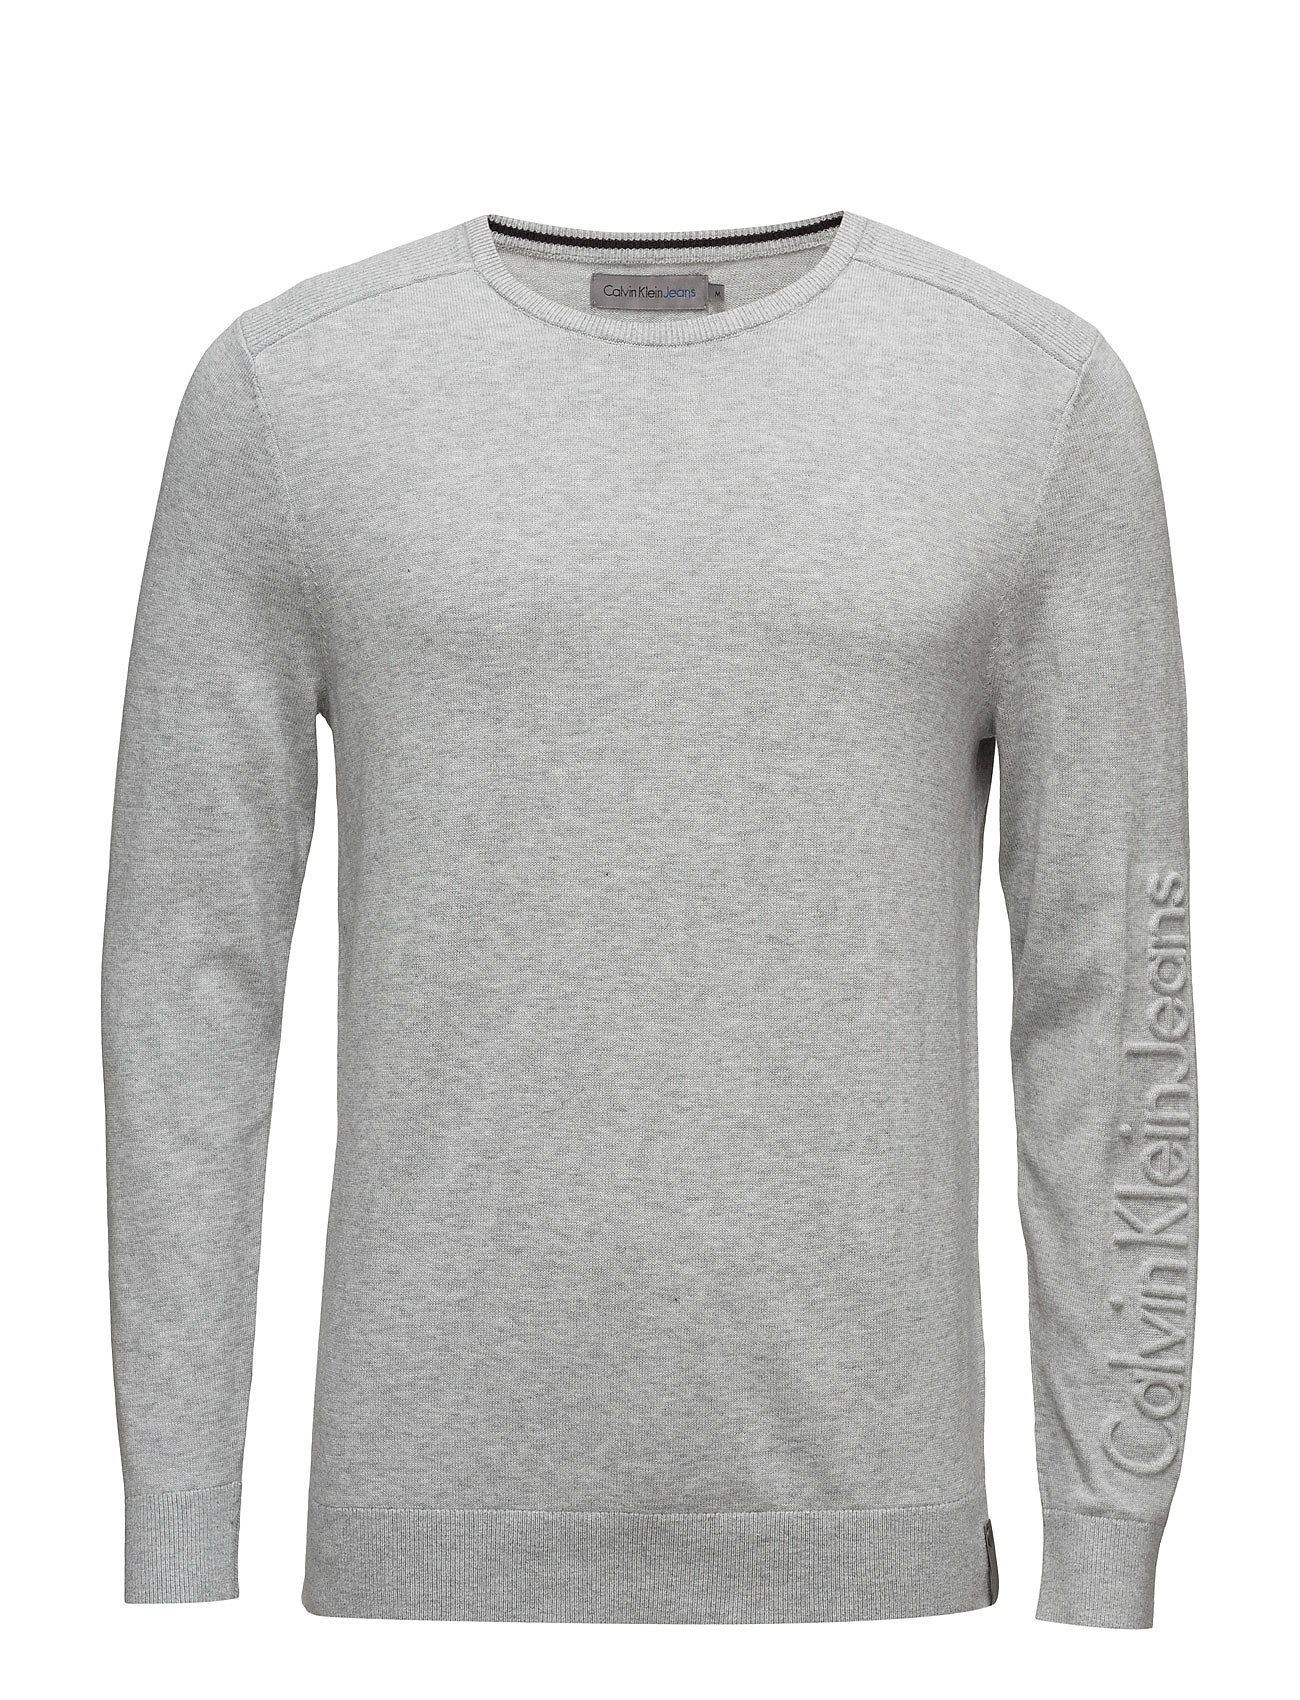 calvin klein jeans Salvon cn sweater ls på boozt.com dk